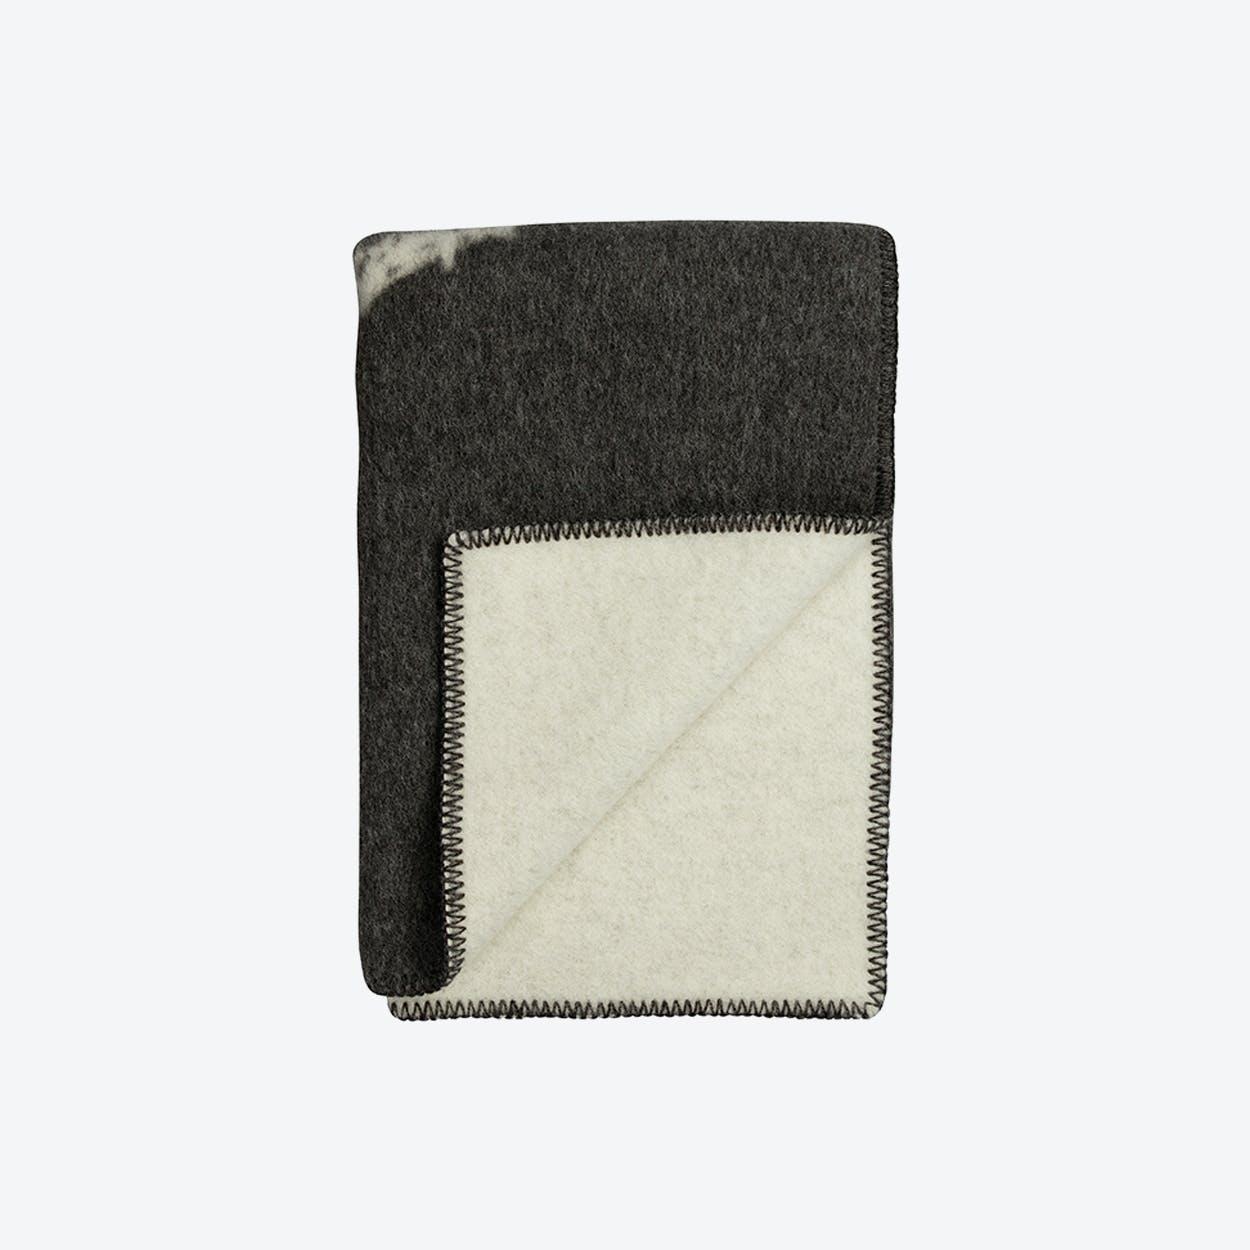 Melgaard Lambswool Throw in Grey/Natural